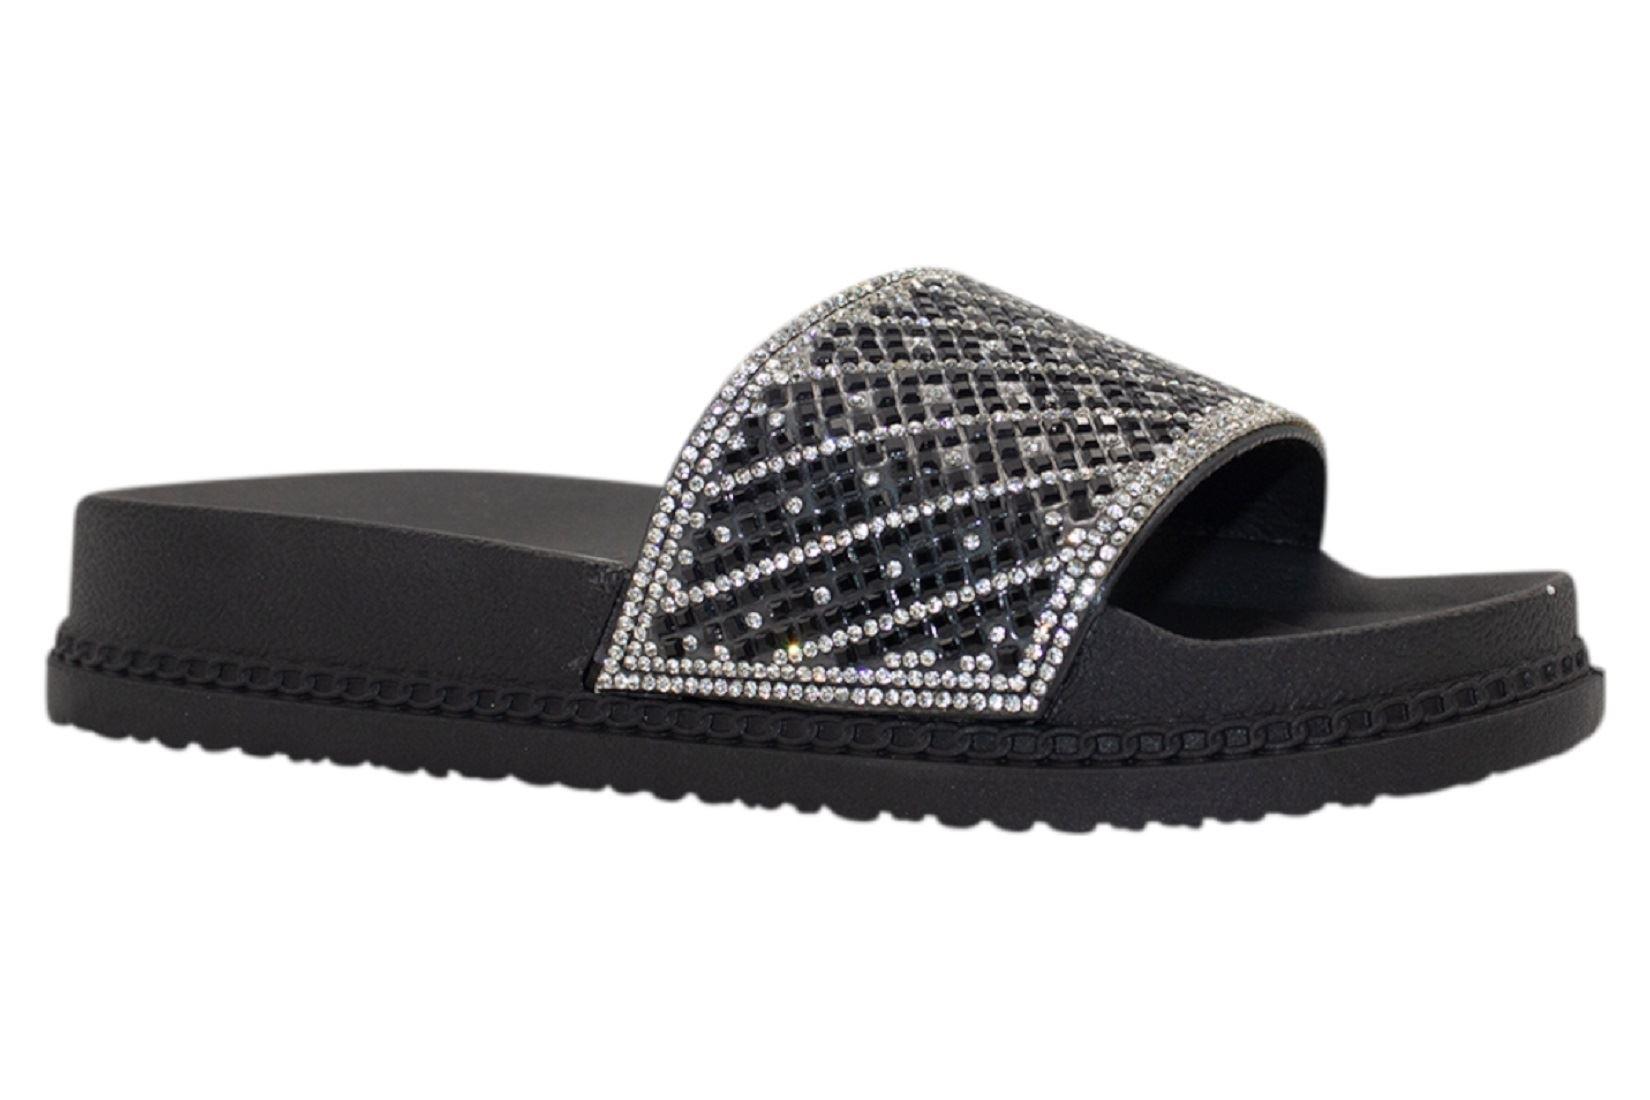 Womens-Sliders-Casual-Slippers-Mules-Ladies-Diamante-Flip-Flop-Sandals-Shoes thumbnail 59